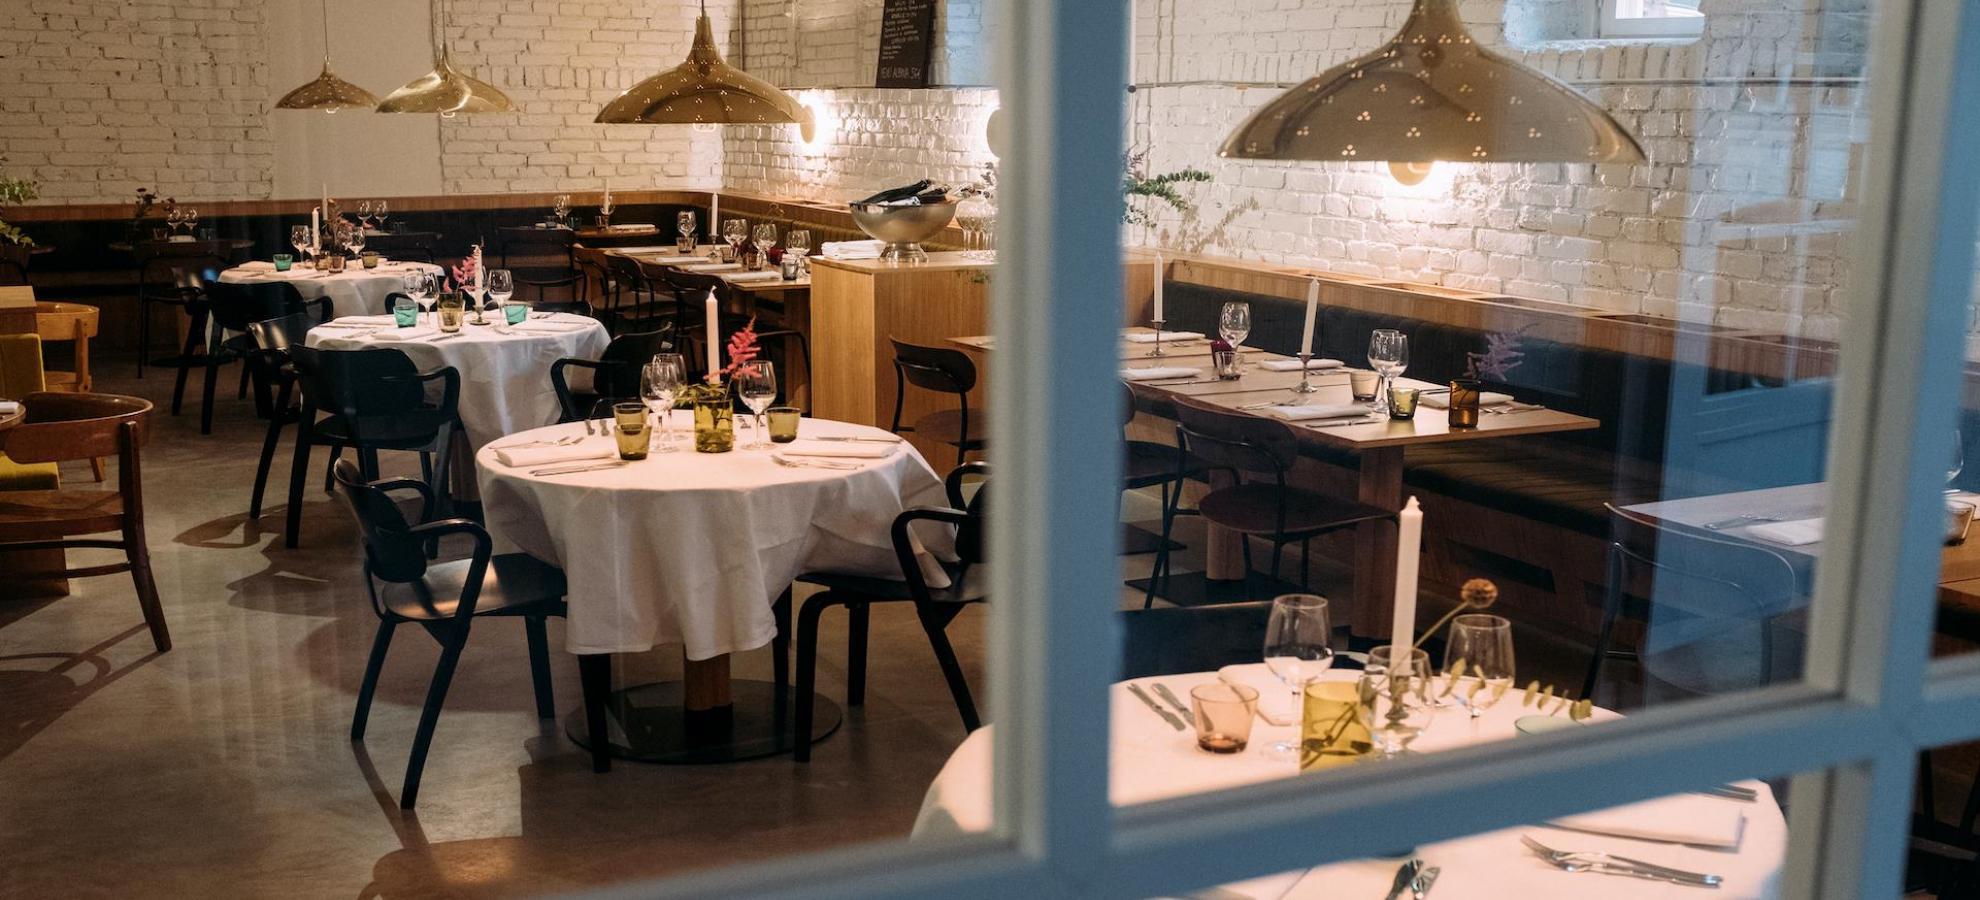 Mexicolainen Ravintola Helsinki